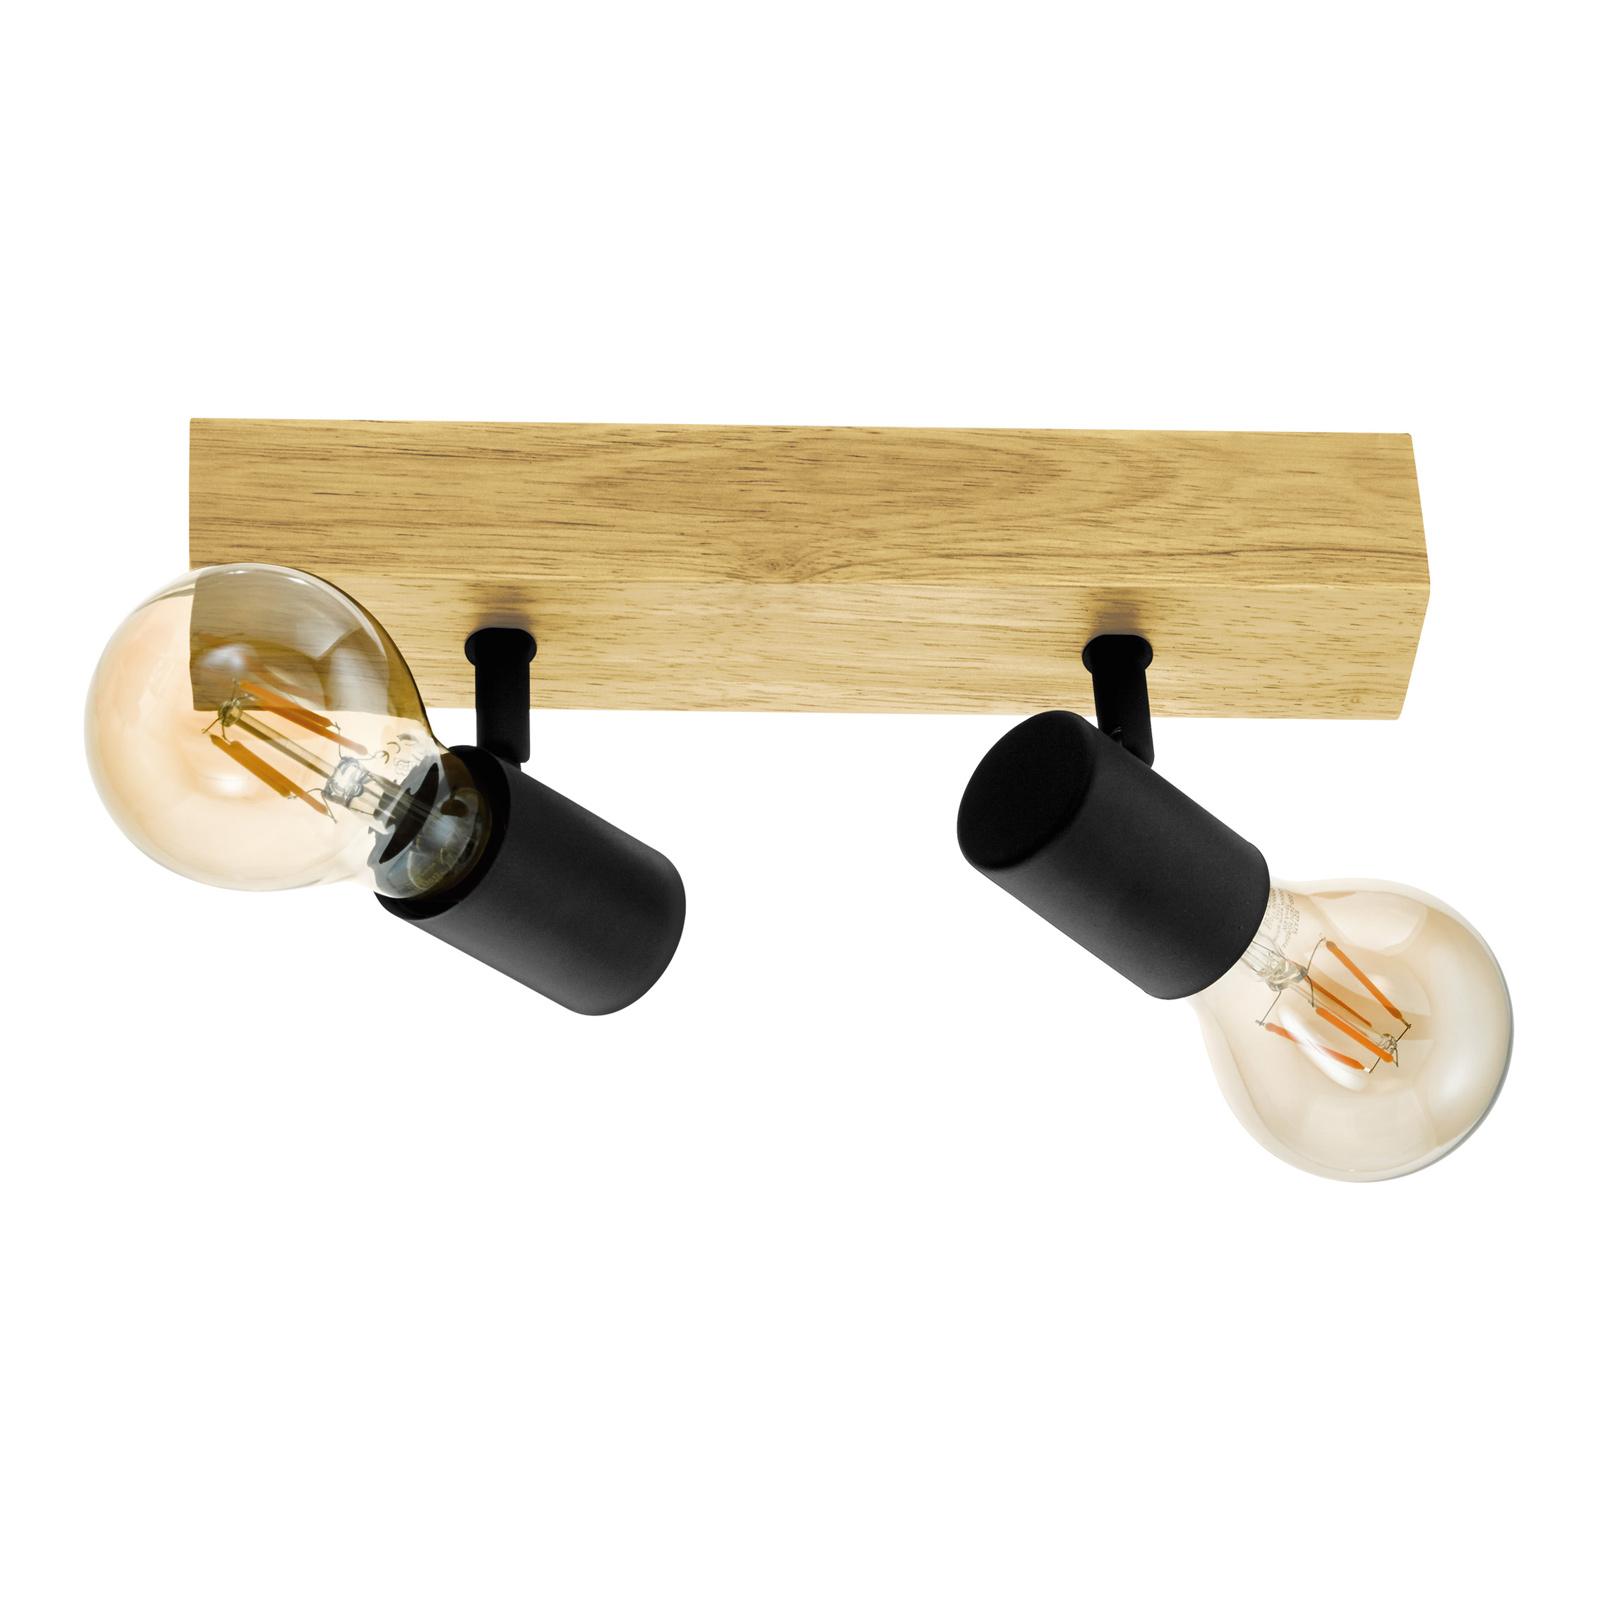 Plafondlamp Townshend 3 van hout, 2-lamps